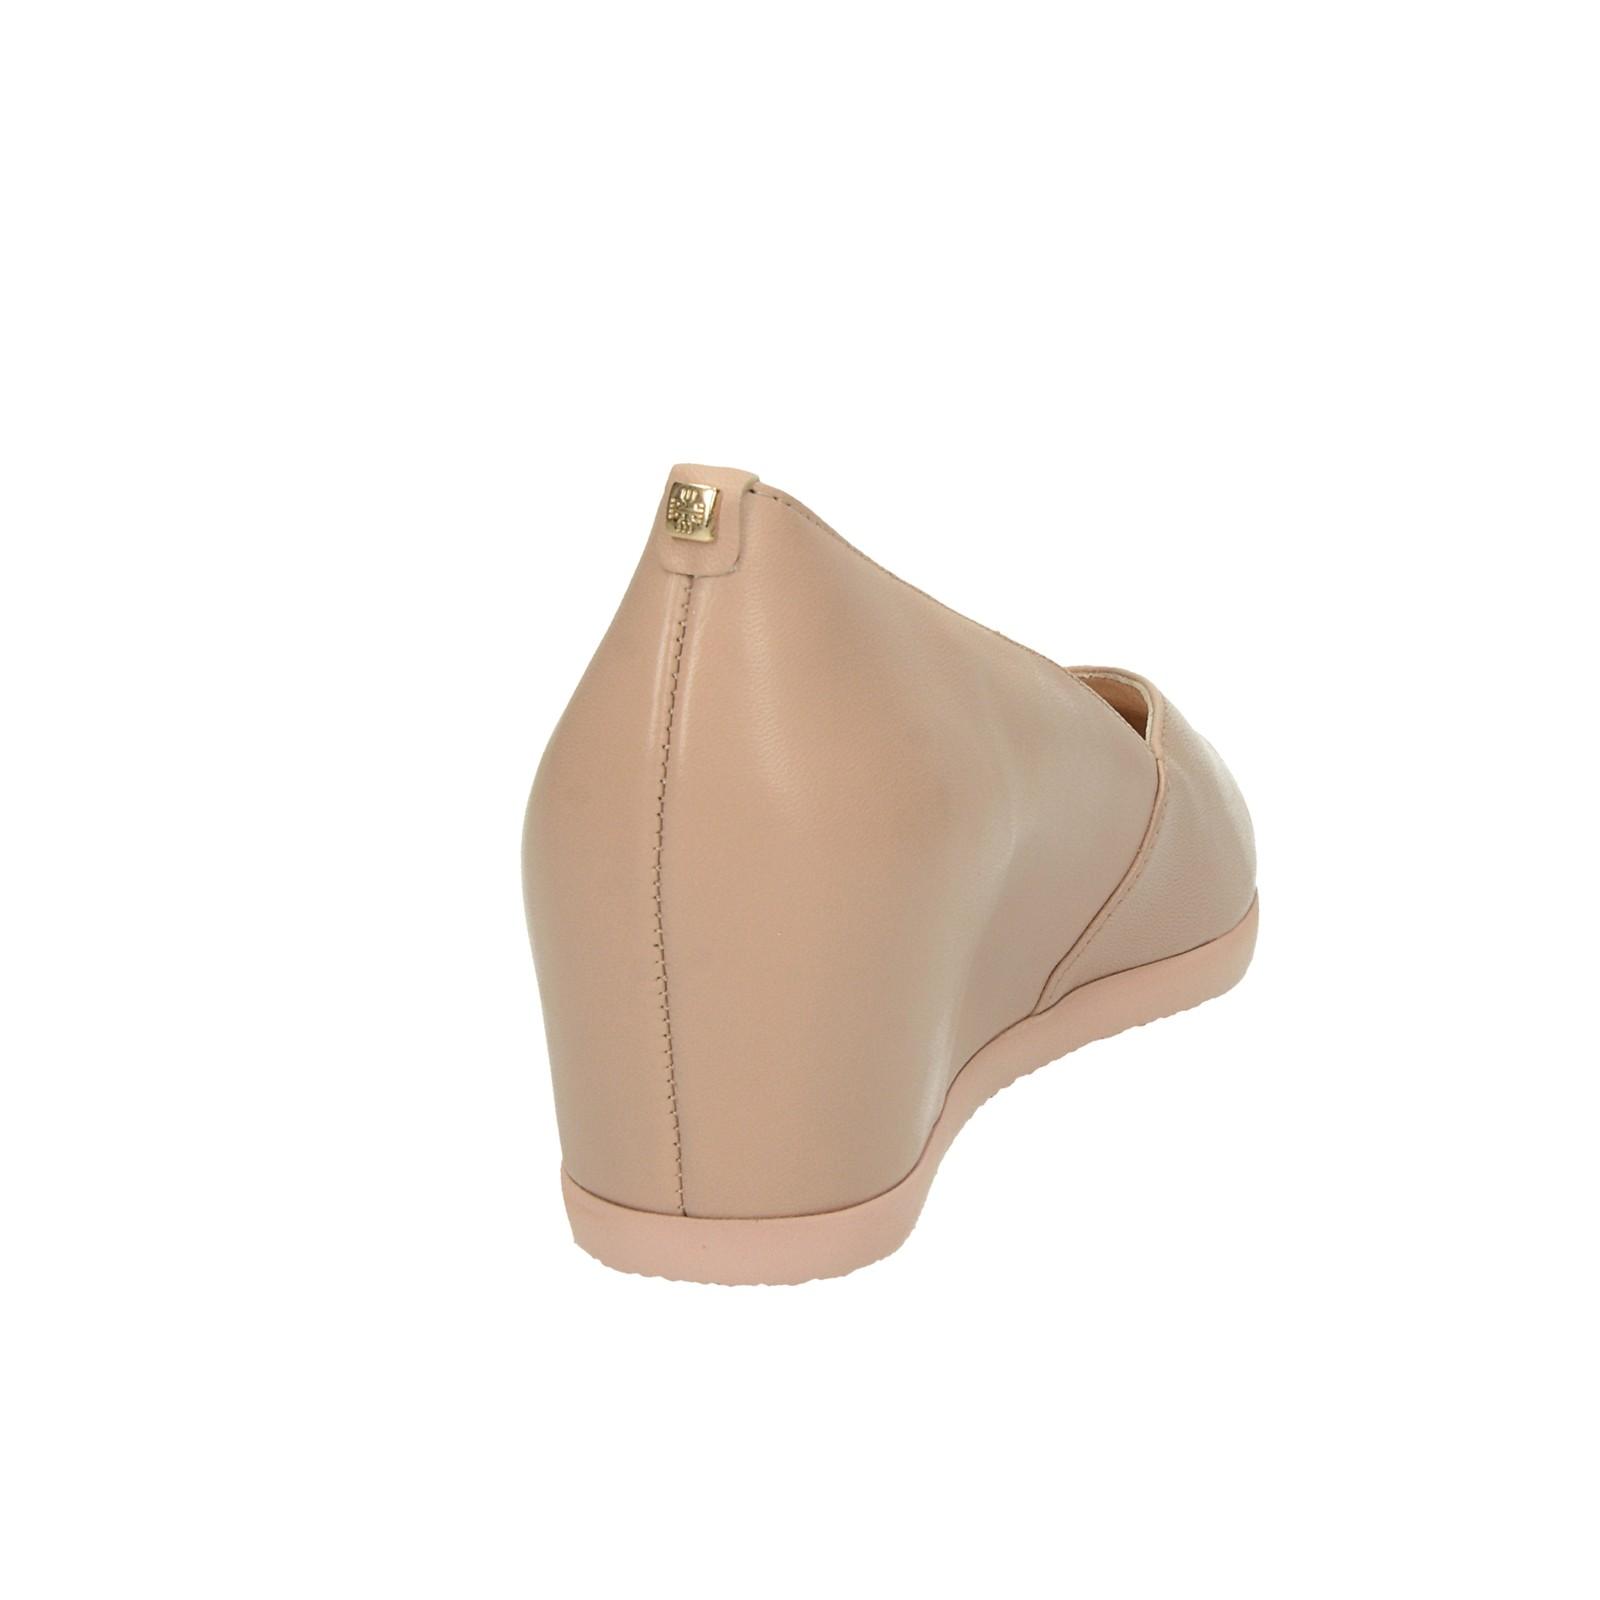 56f10982493a ... Högl dámské kožené balerínky na klinové podrážce - béžové ...